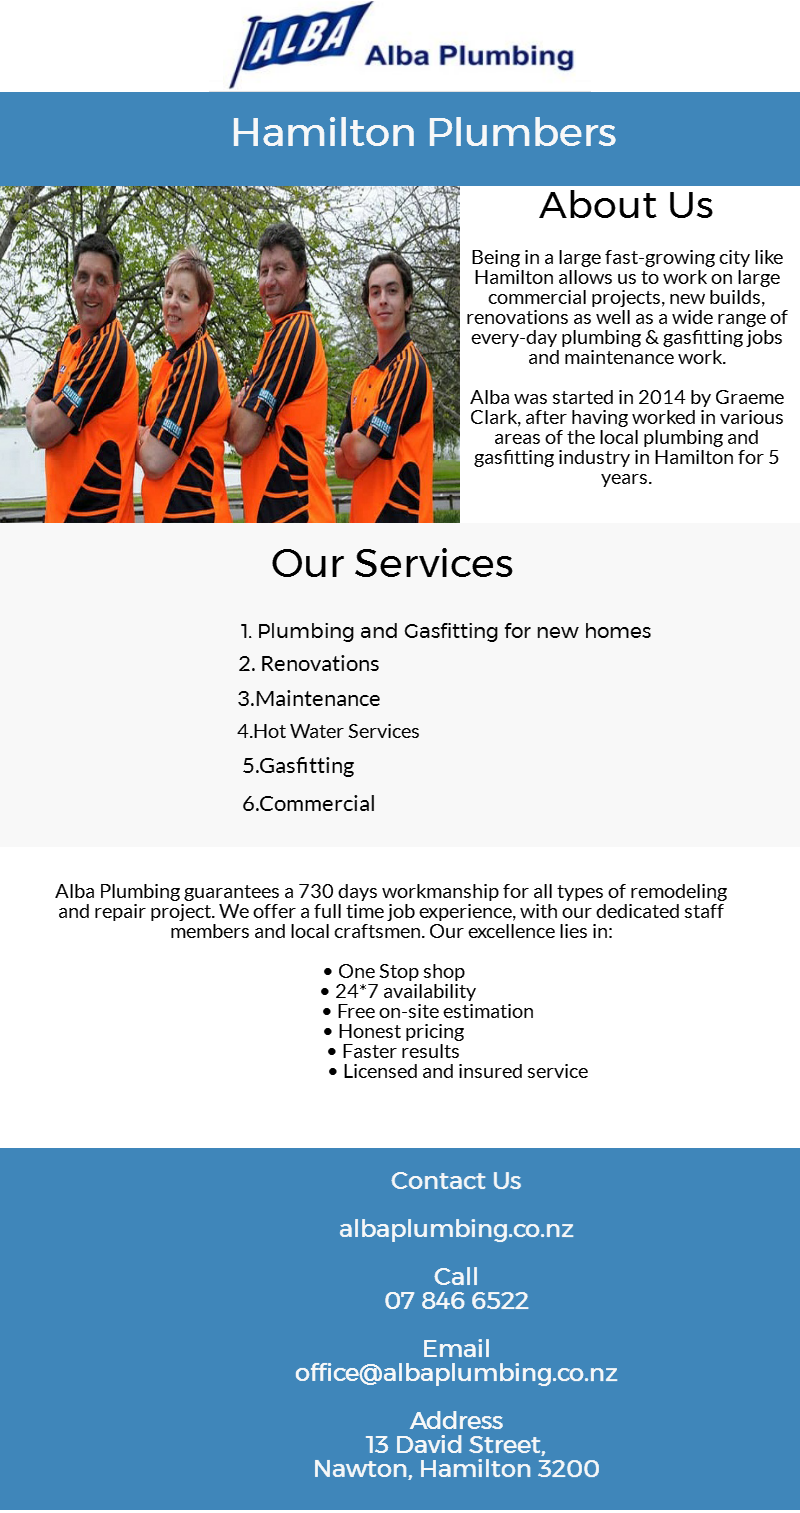 Alba plumbing is here with top notch hamilton plumbing solutions